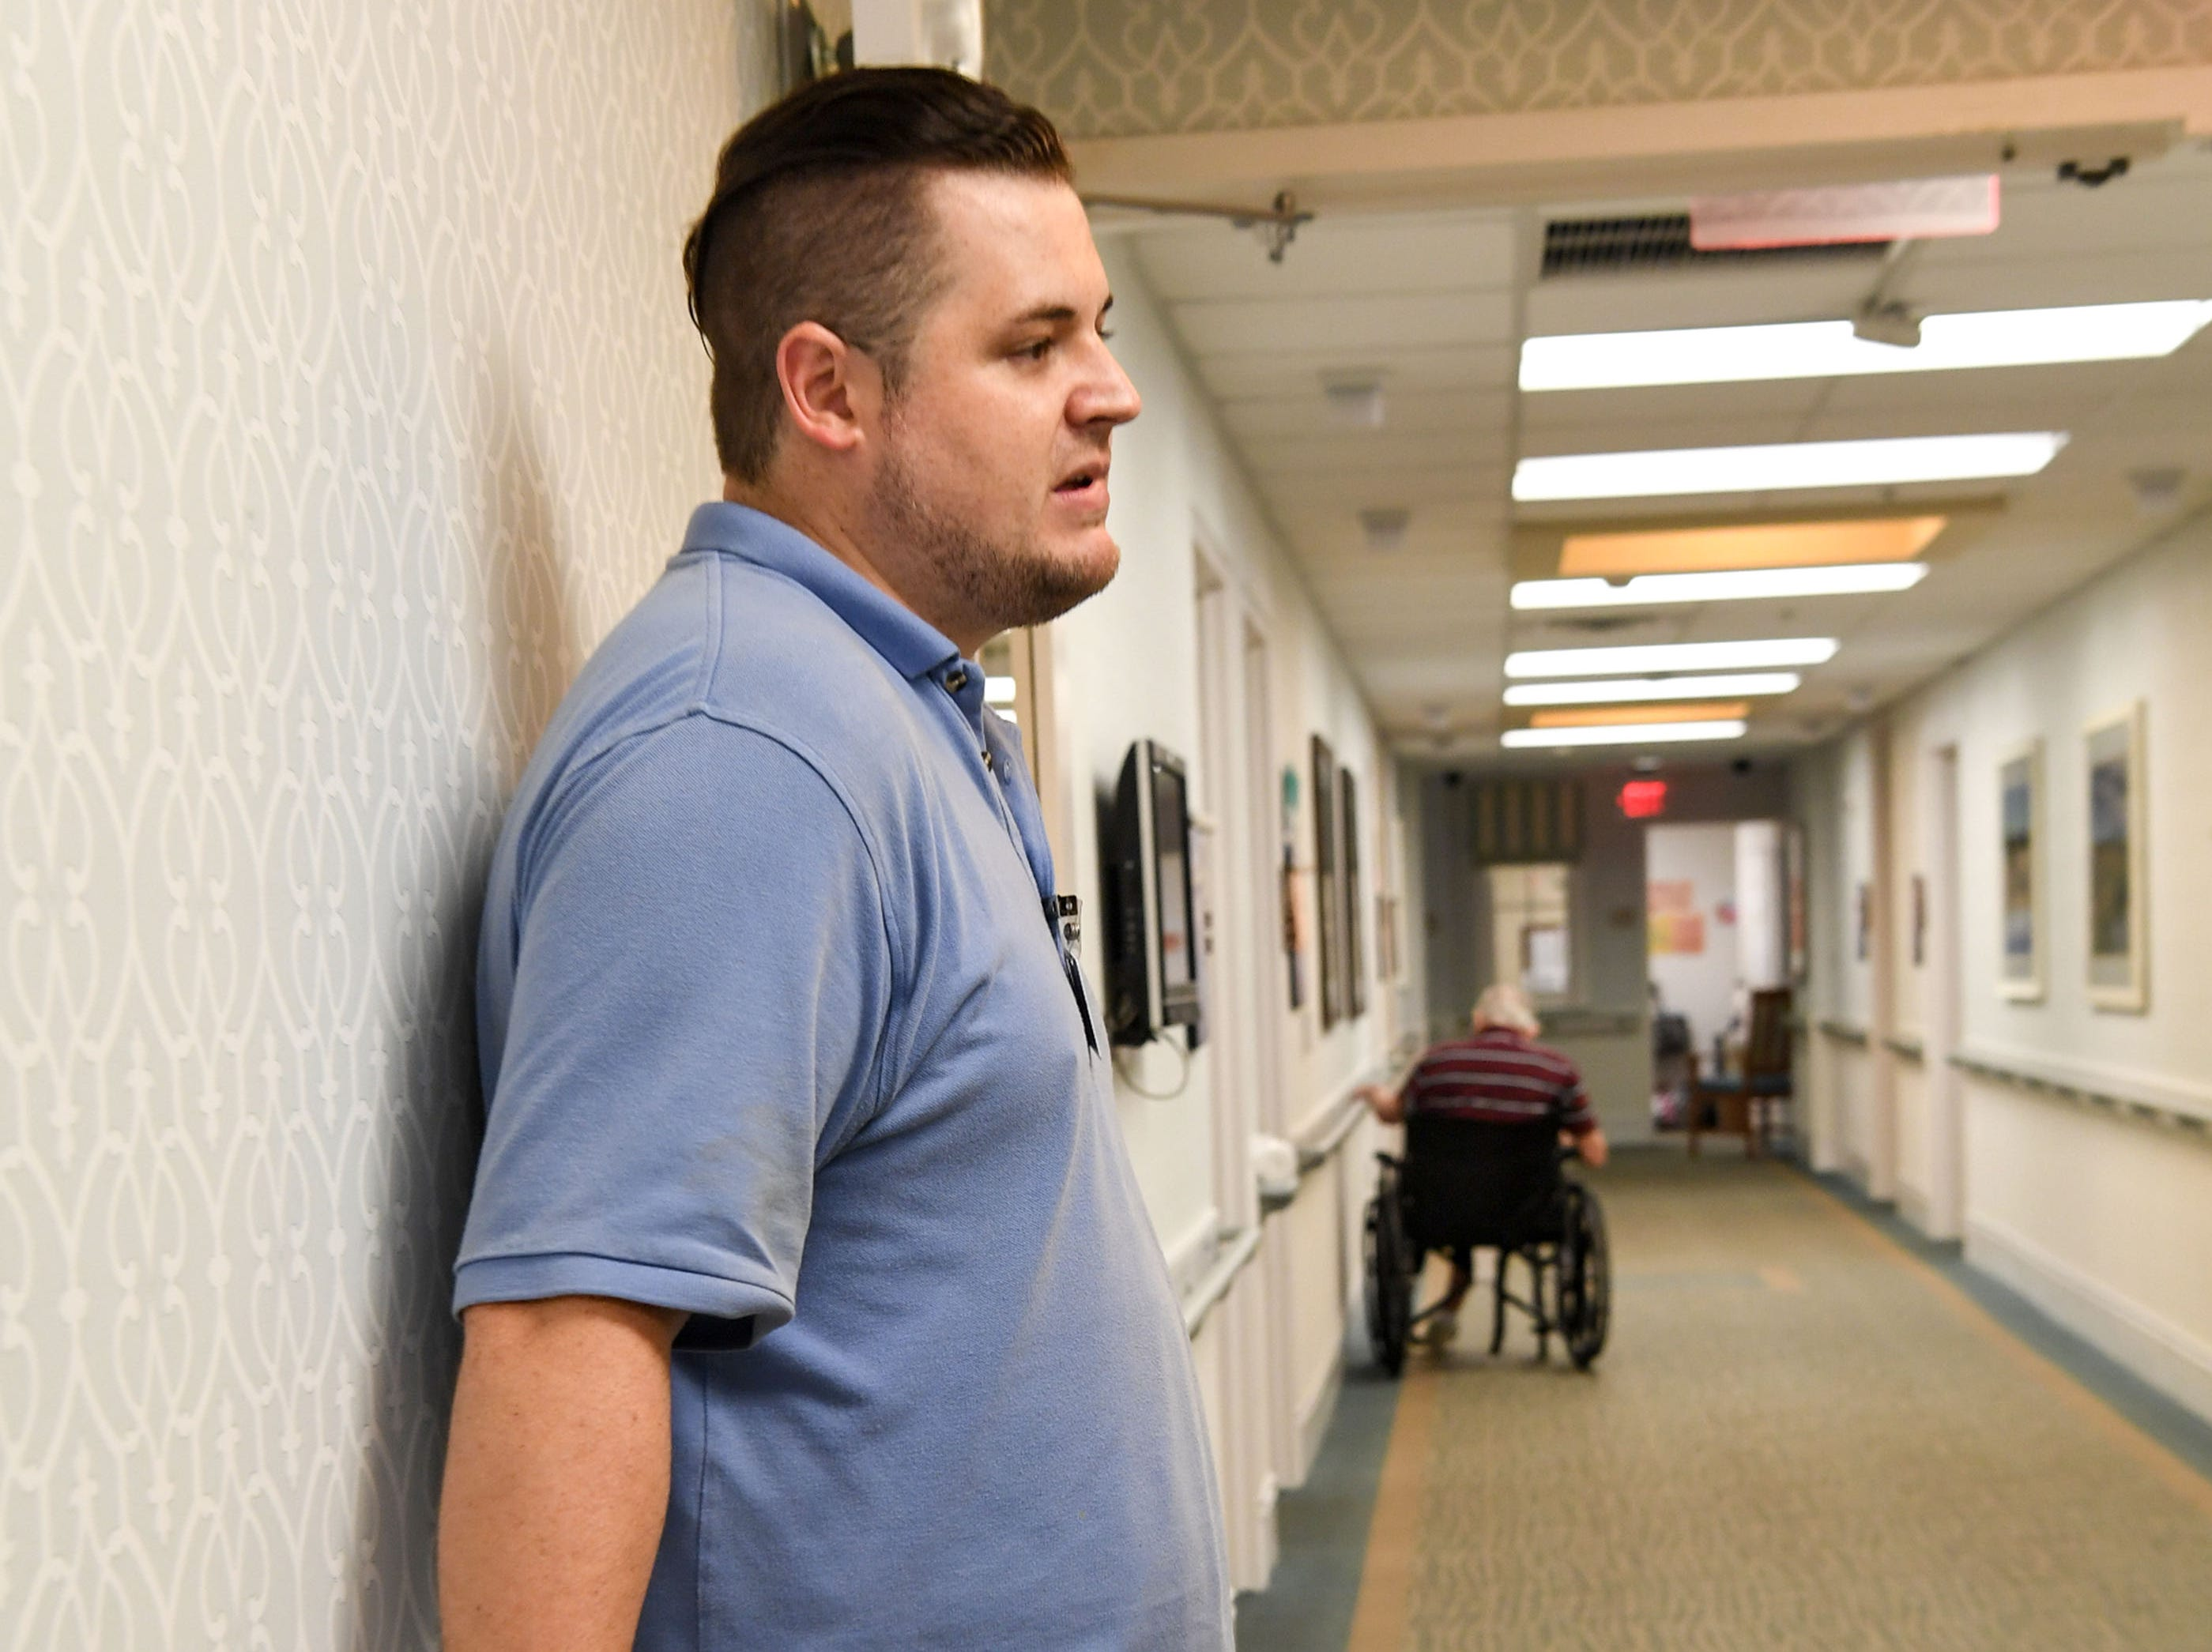 Wayne Schaefer, Clinical Coordinator at the Davis Community nursing home and assisted living facility in Wilmington, North Carolina on Thursday, September 13, 2018. (Ken Ruinard / Greenville News / Gannett USA Today Network / 2018 )